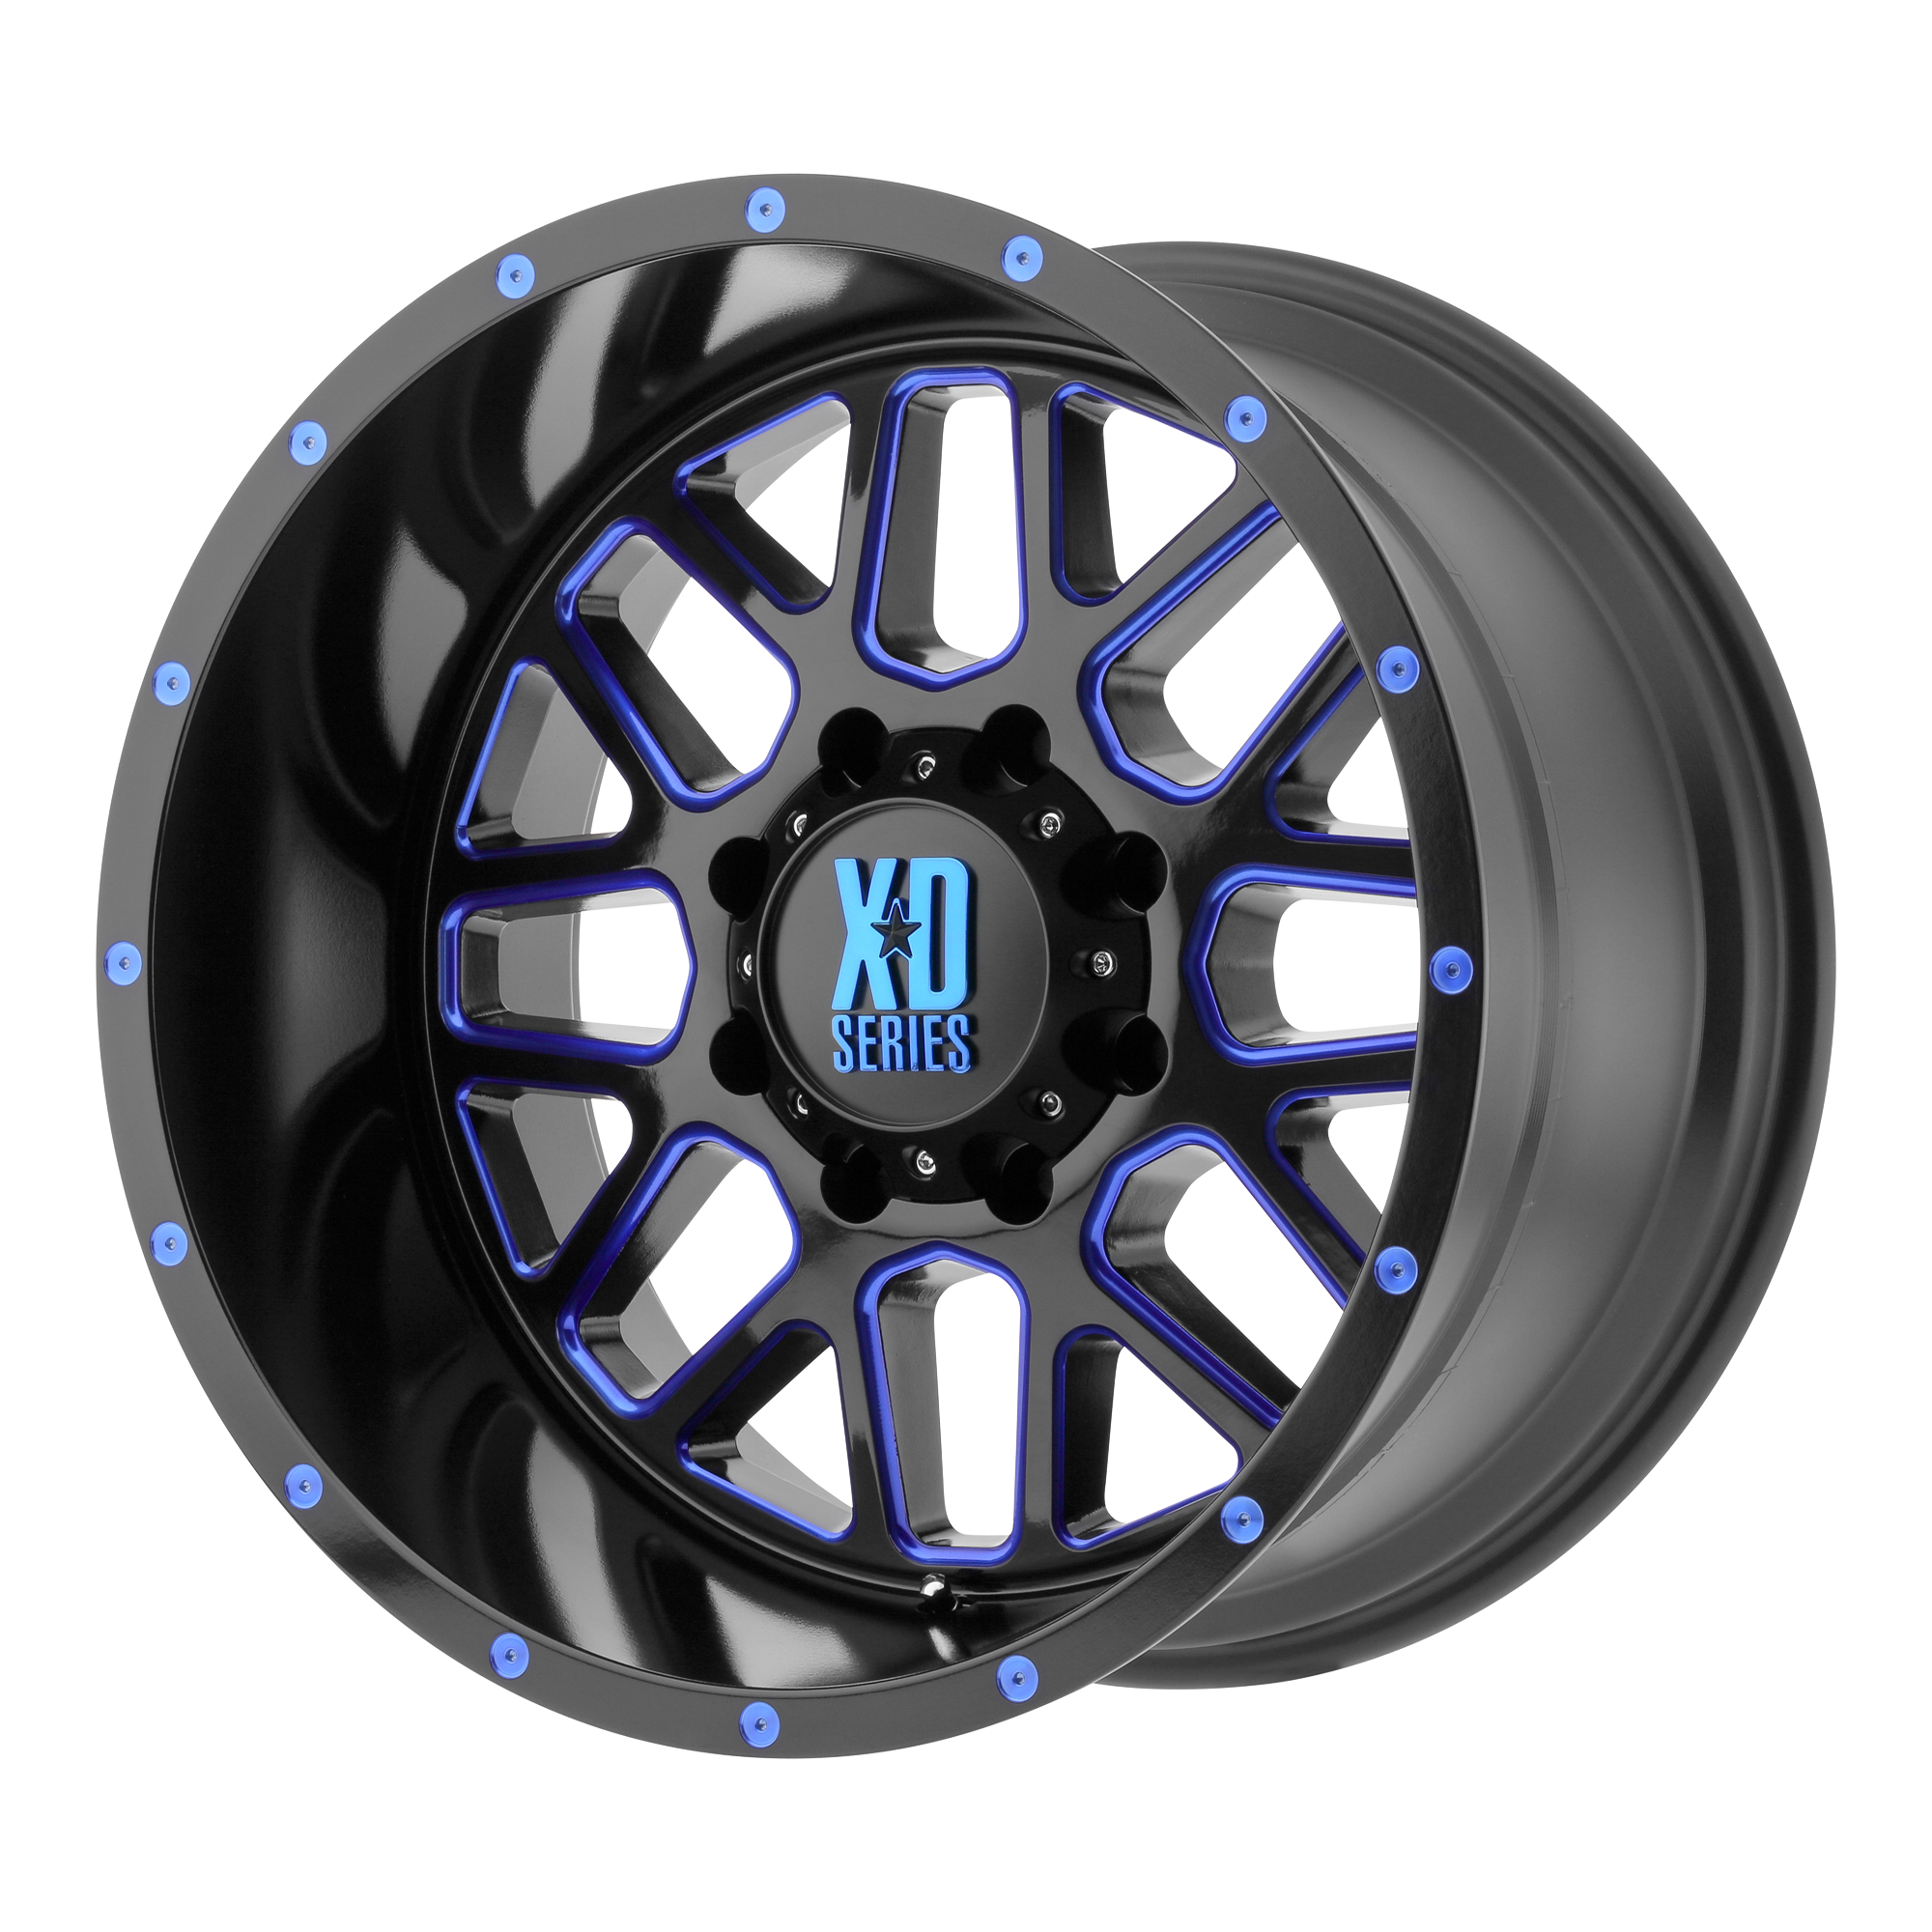 XD SERIES XD820 GRENADE hliníkové disky 9x18 5x127 ET-12 Satin  Black Milled With Blue Clear Coat